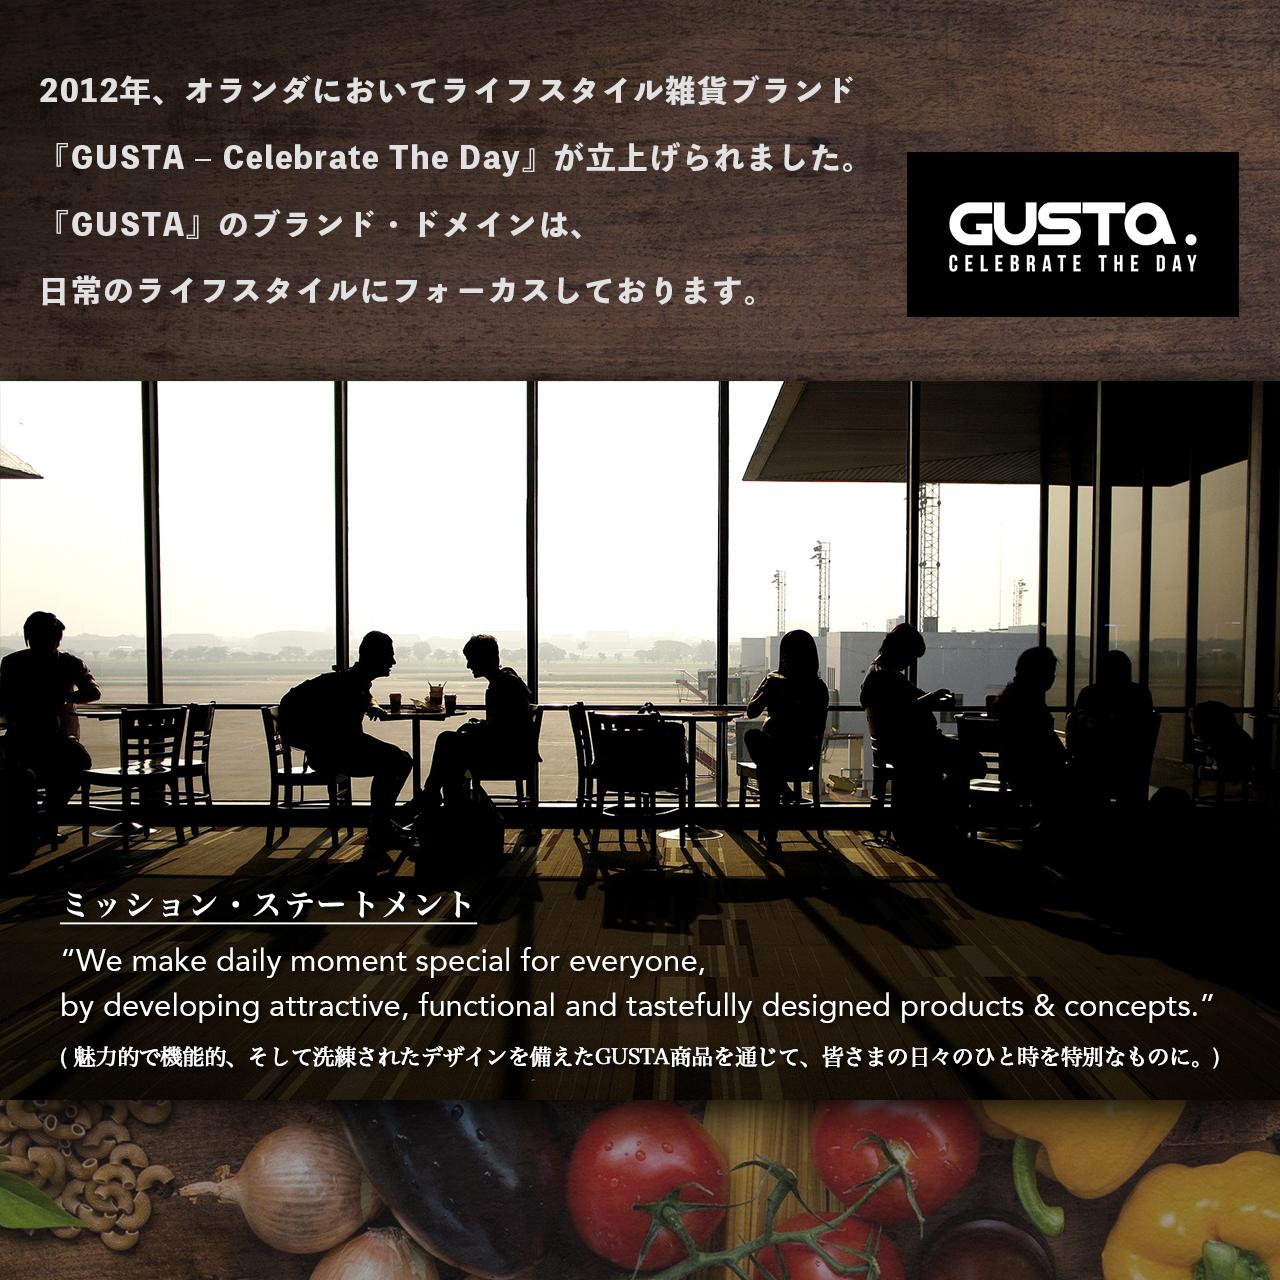 GUSTA - Celebrate The Day のブランド・ドメインとミッション・ステートメント